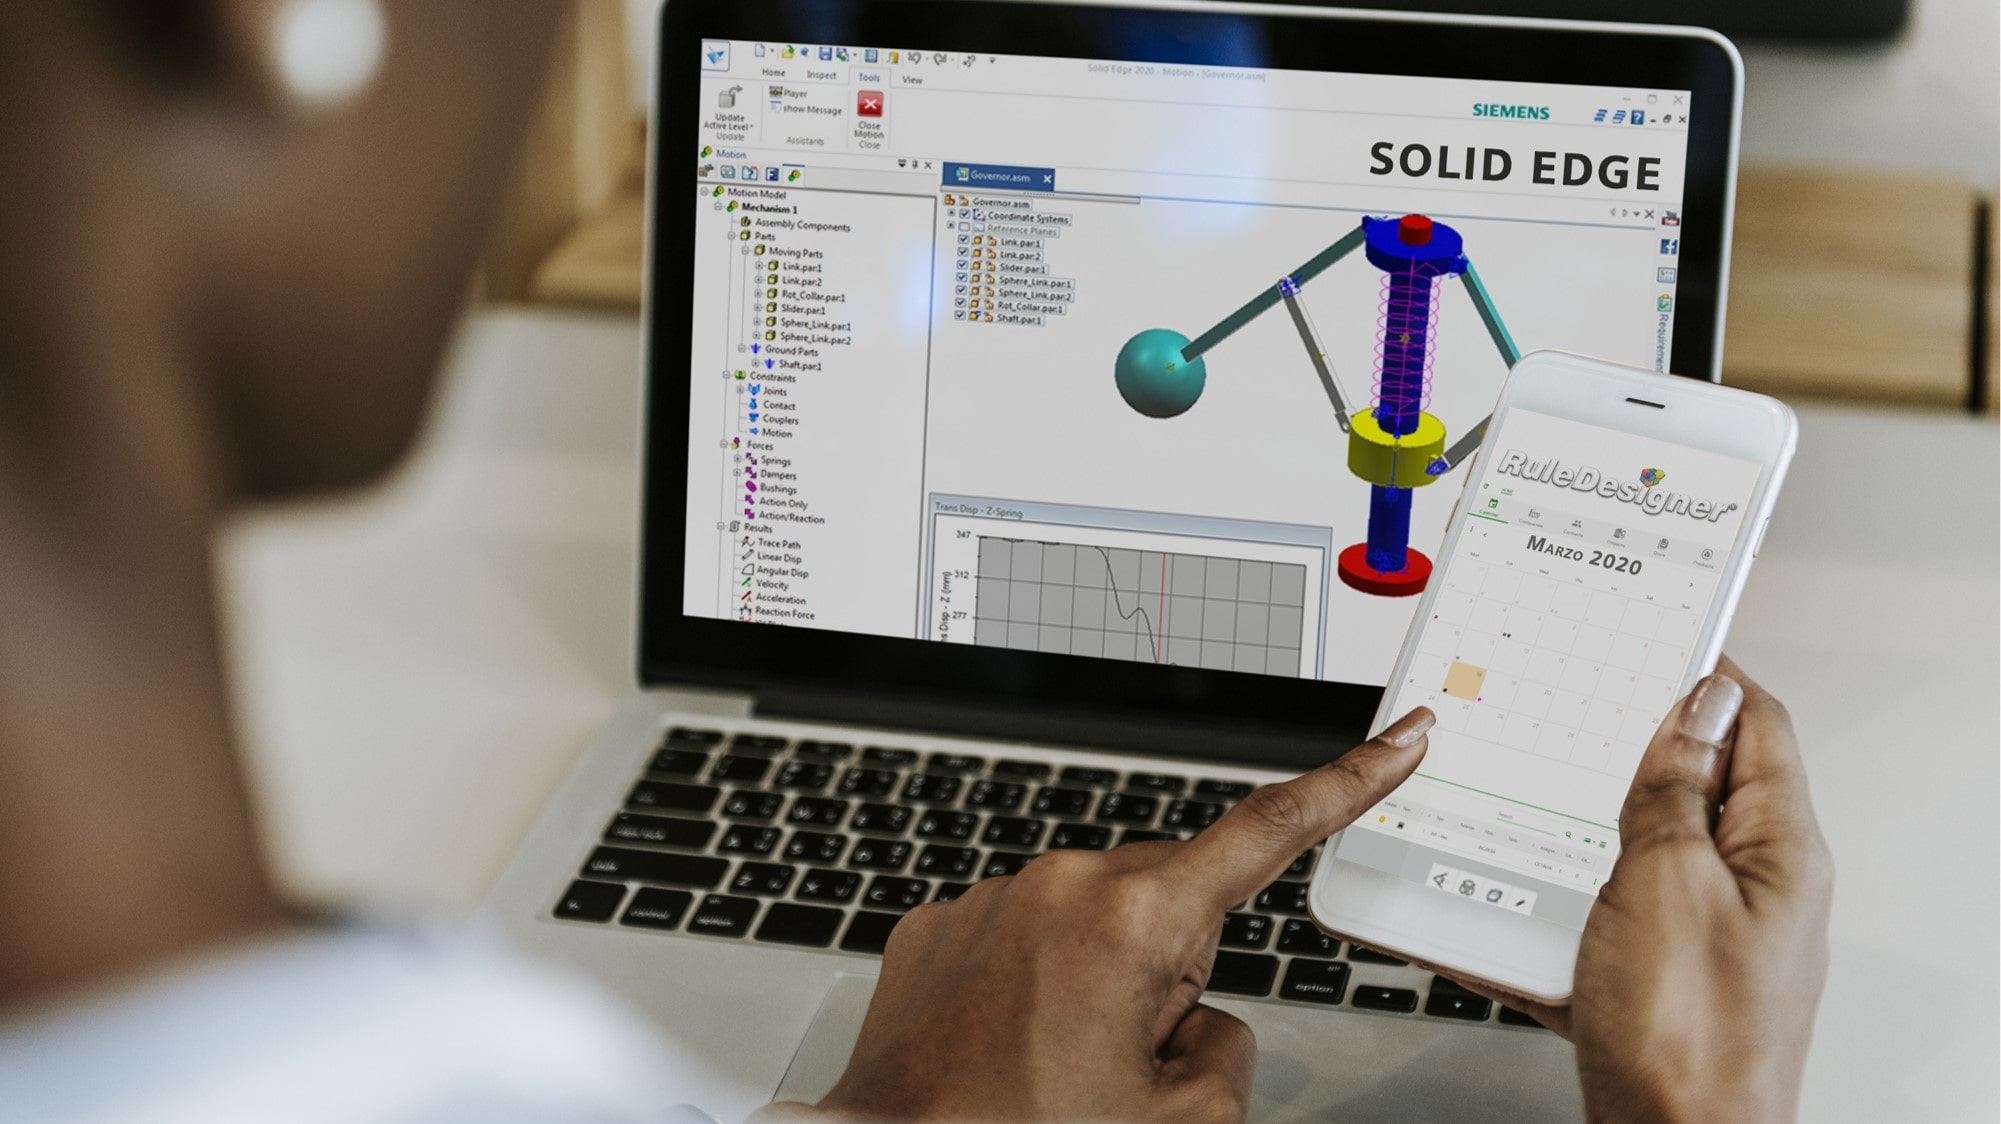 Webinar on demand |  Solid Edge 2020 Simulazione Cinematica  [by Engineering]